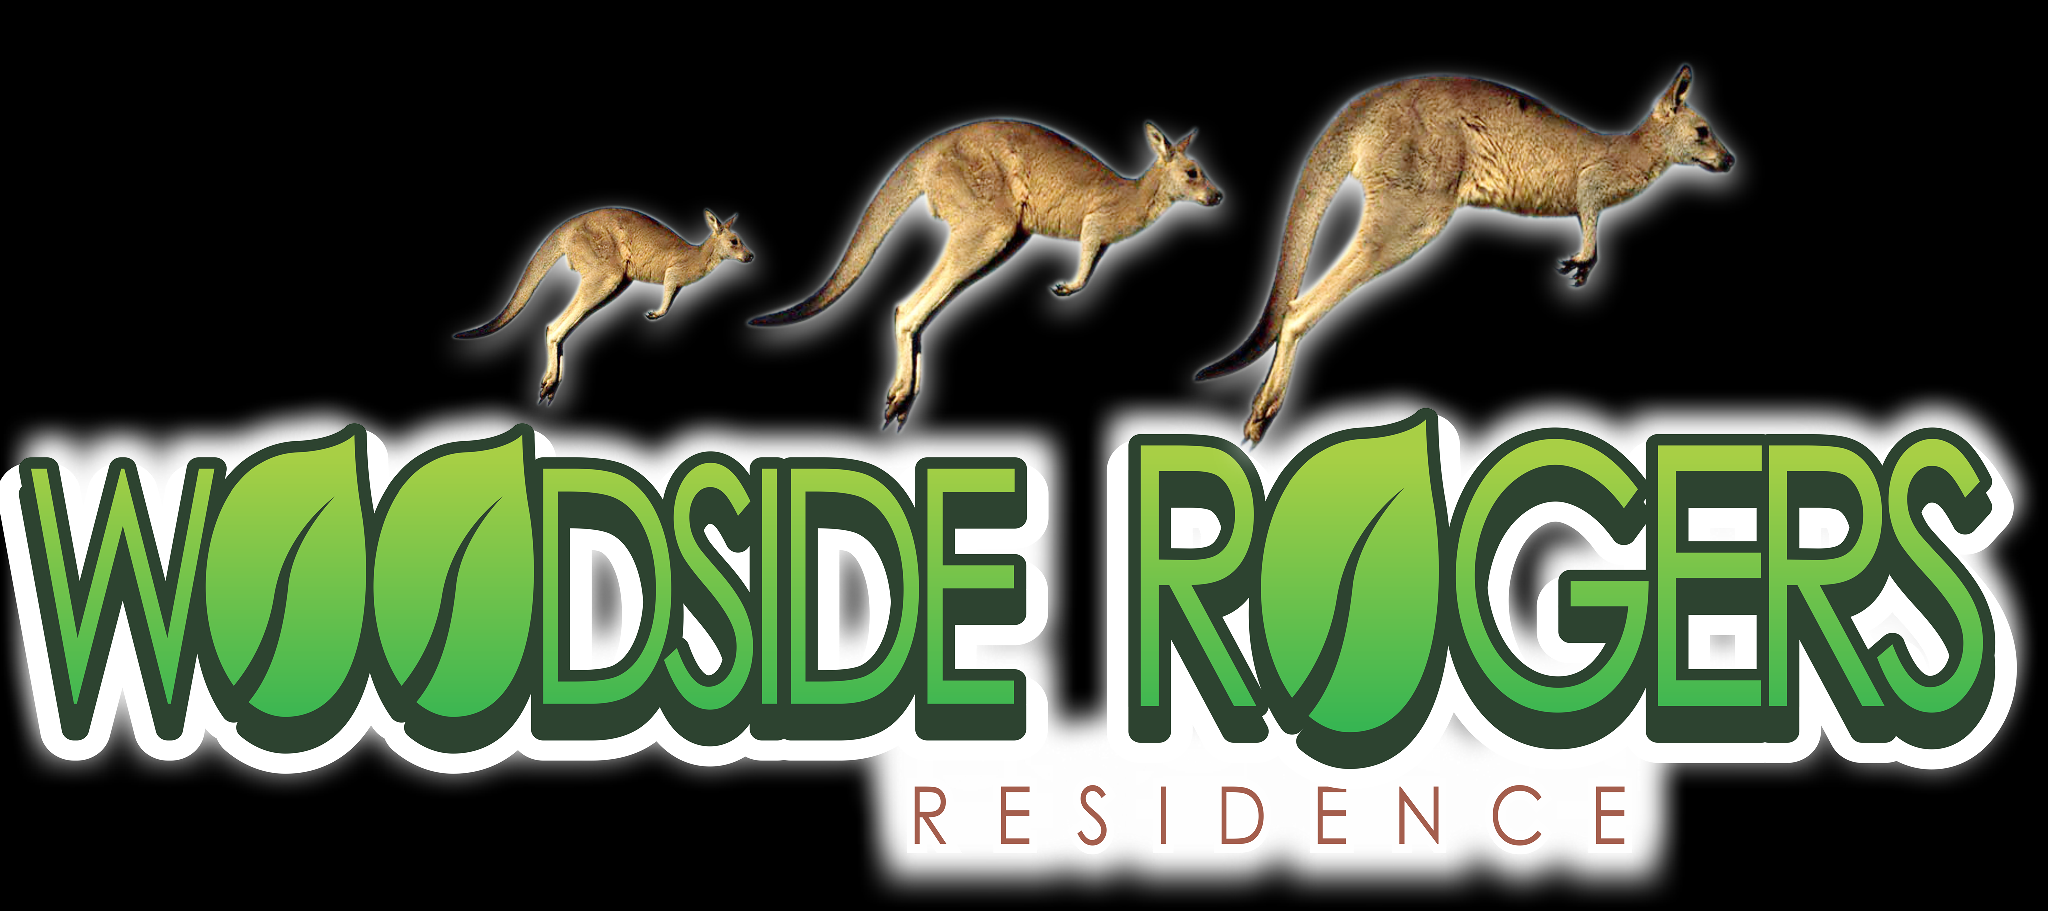 Woodside Rogers Residence   High Speed Internetq